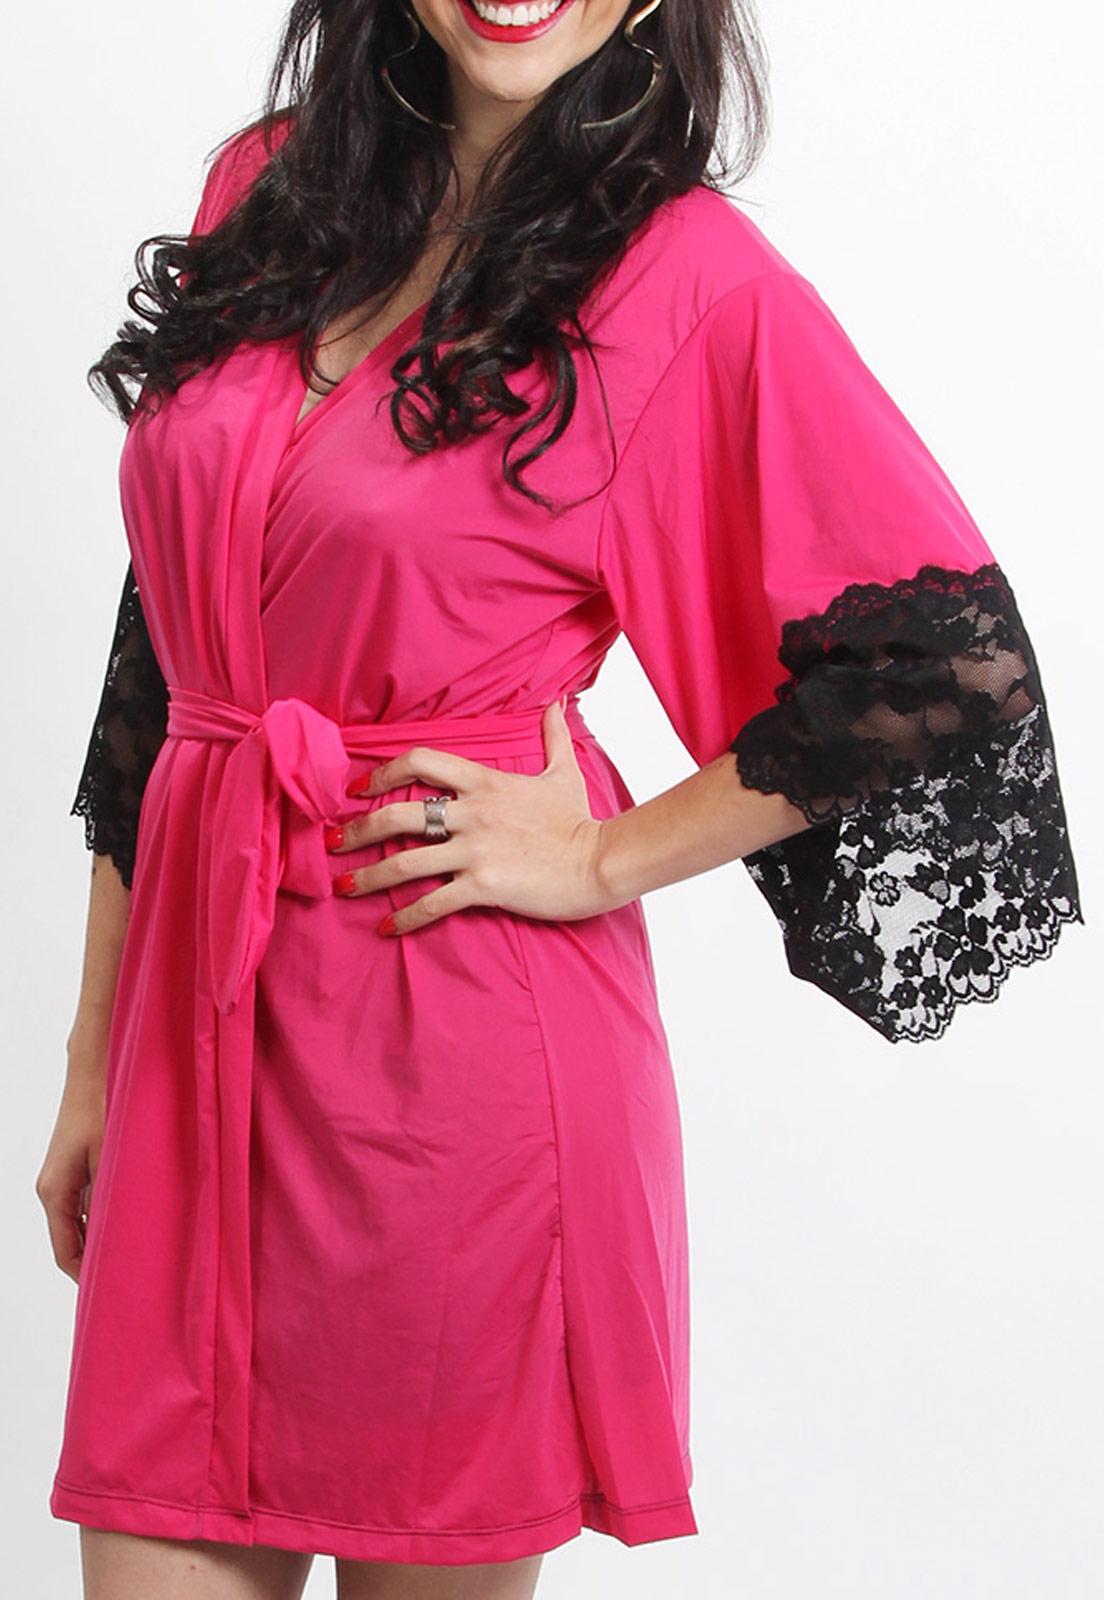 Robe Pink com Renda